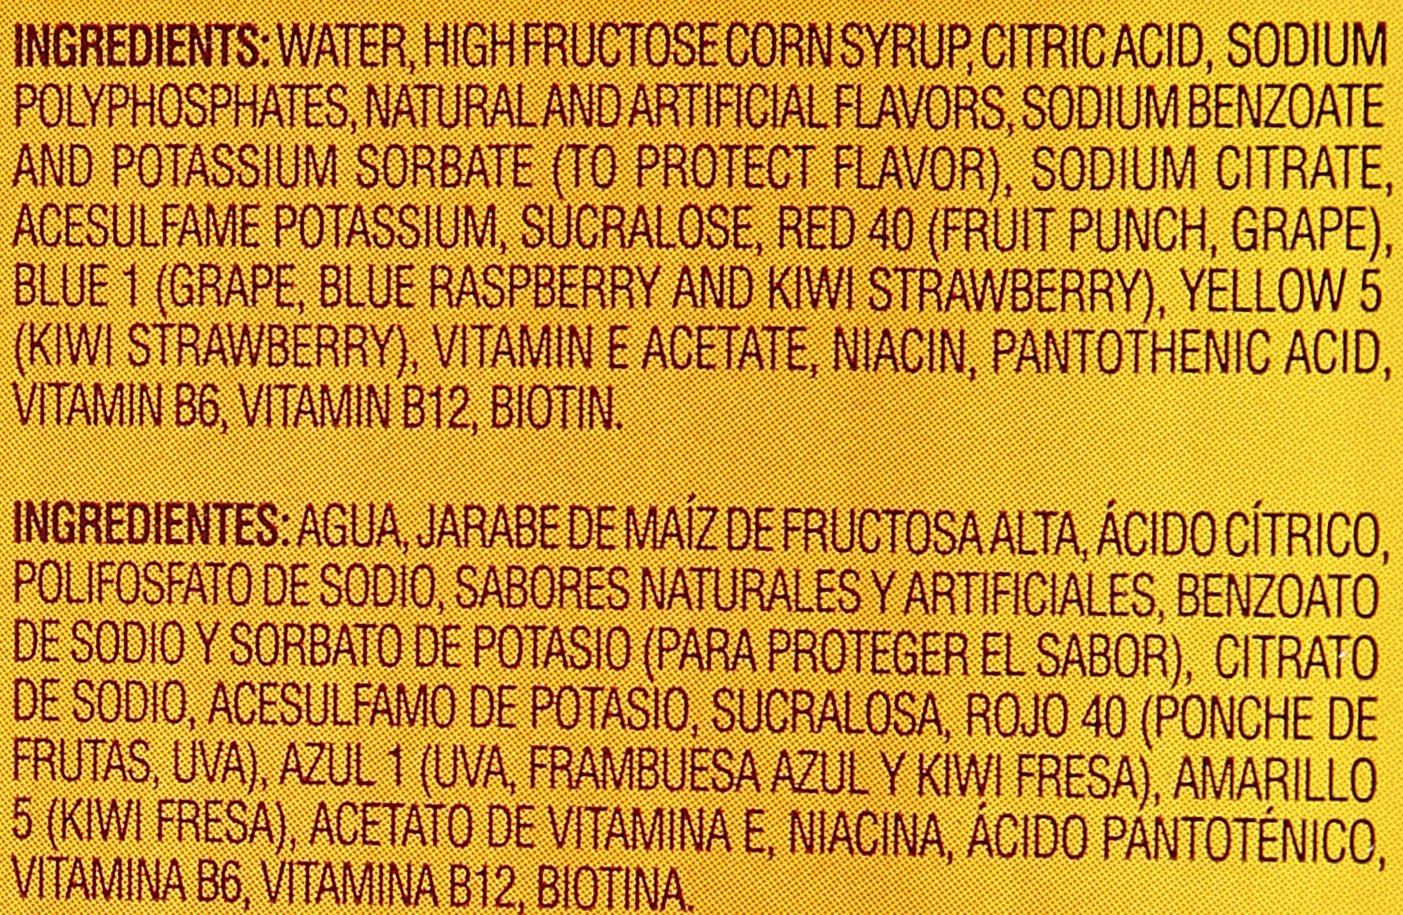 Amazon.com : Little Hug 4 Flavor Team Pack Fruit Drink, 8 oz : Grocery & Gourmet Food